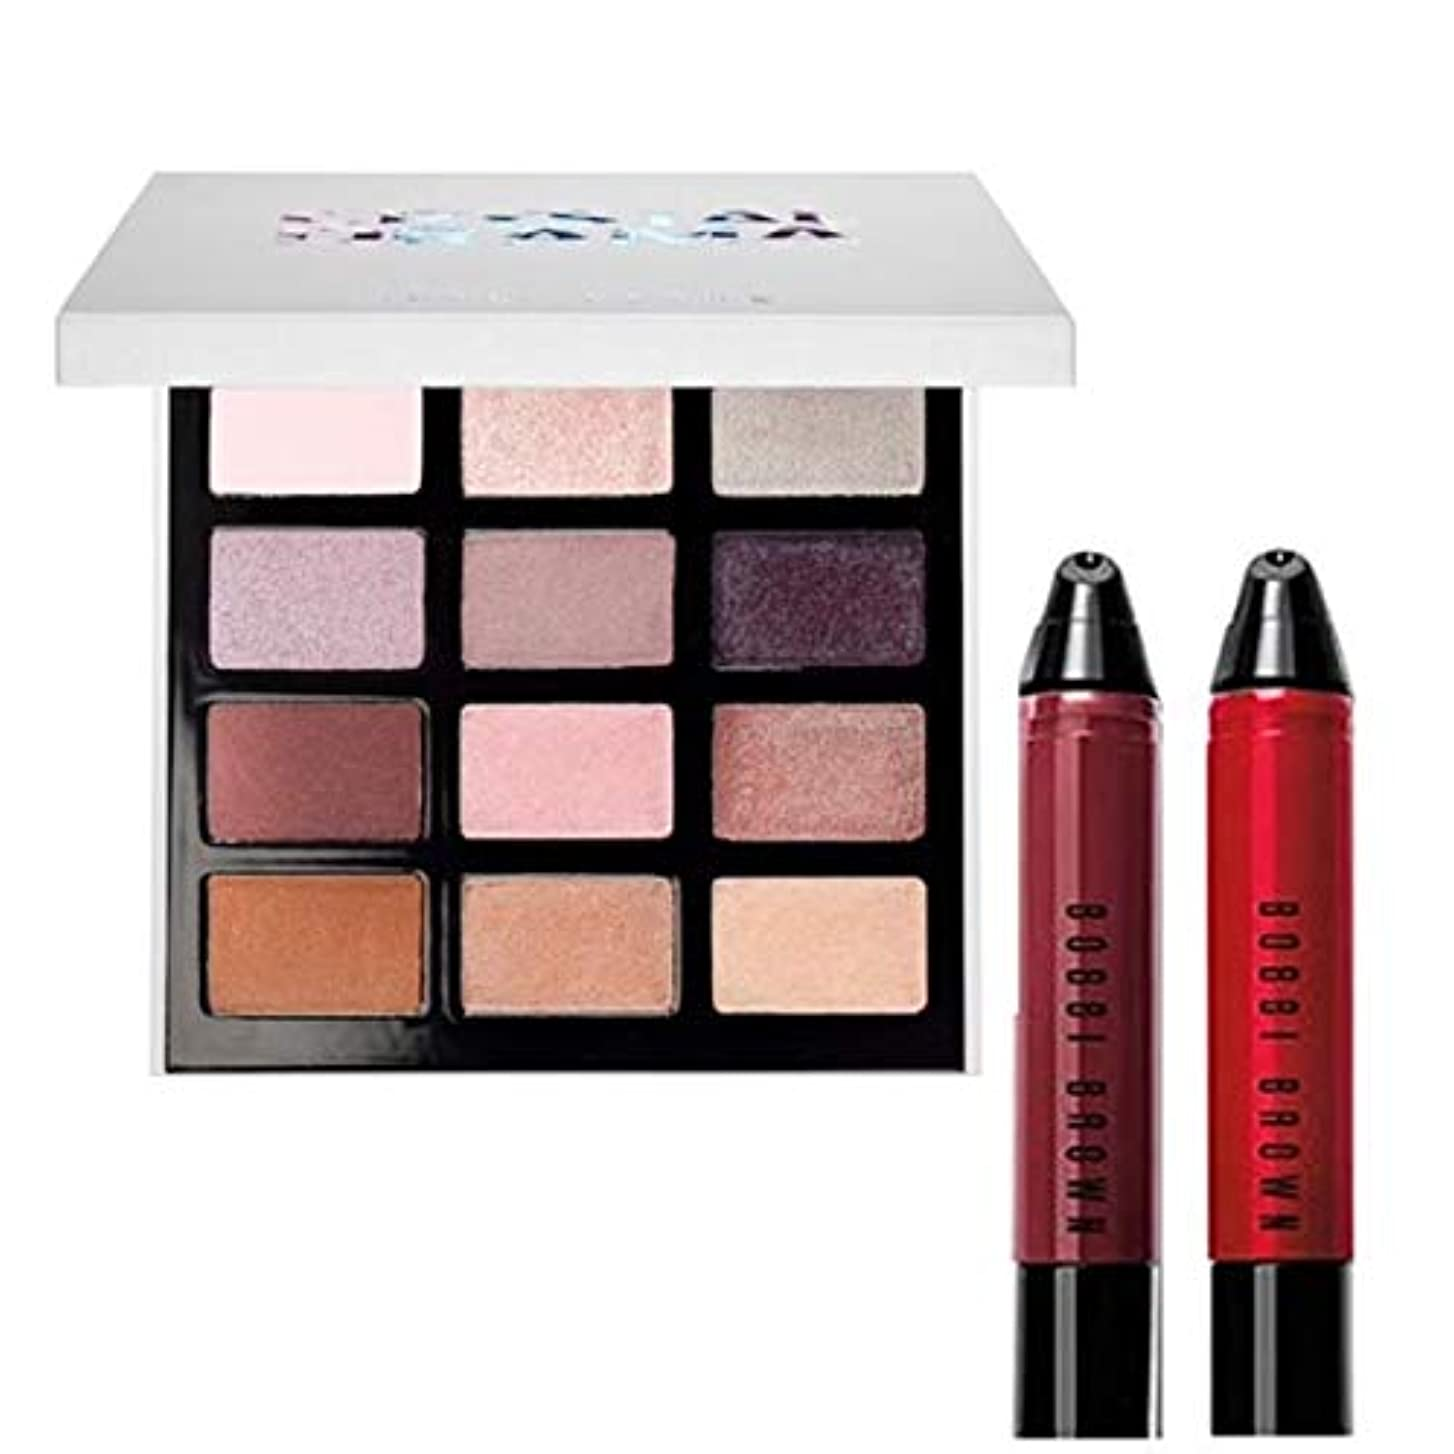 文トレイル口実Bobbi Brown 限定版,Crystal Drama Eyeshadow Palette & Lip Art Mini Art Stick Liquid Lip 2Set [海外直送品] [並行輸入品]